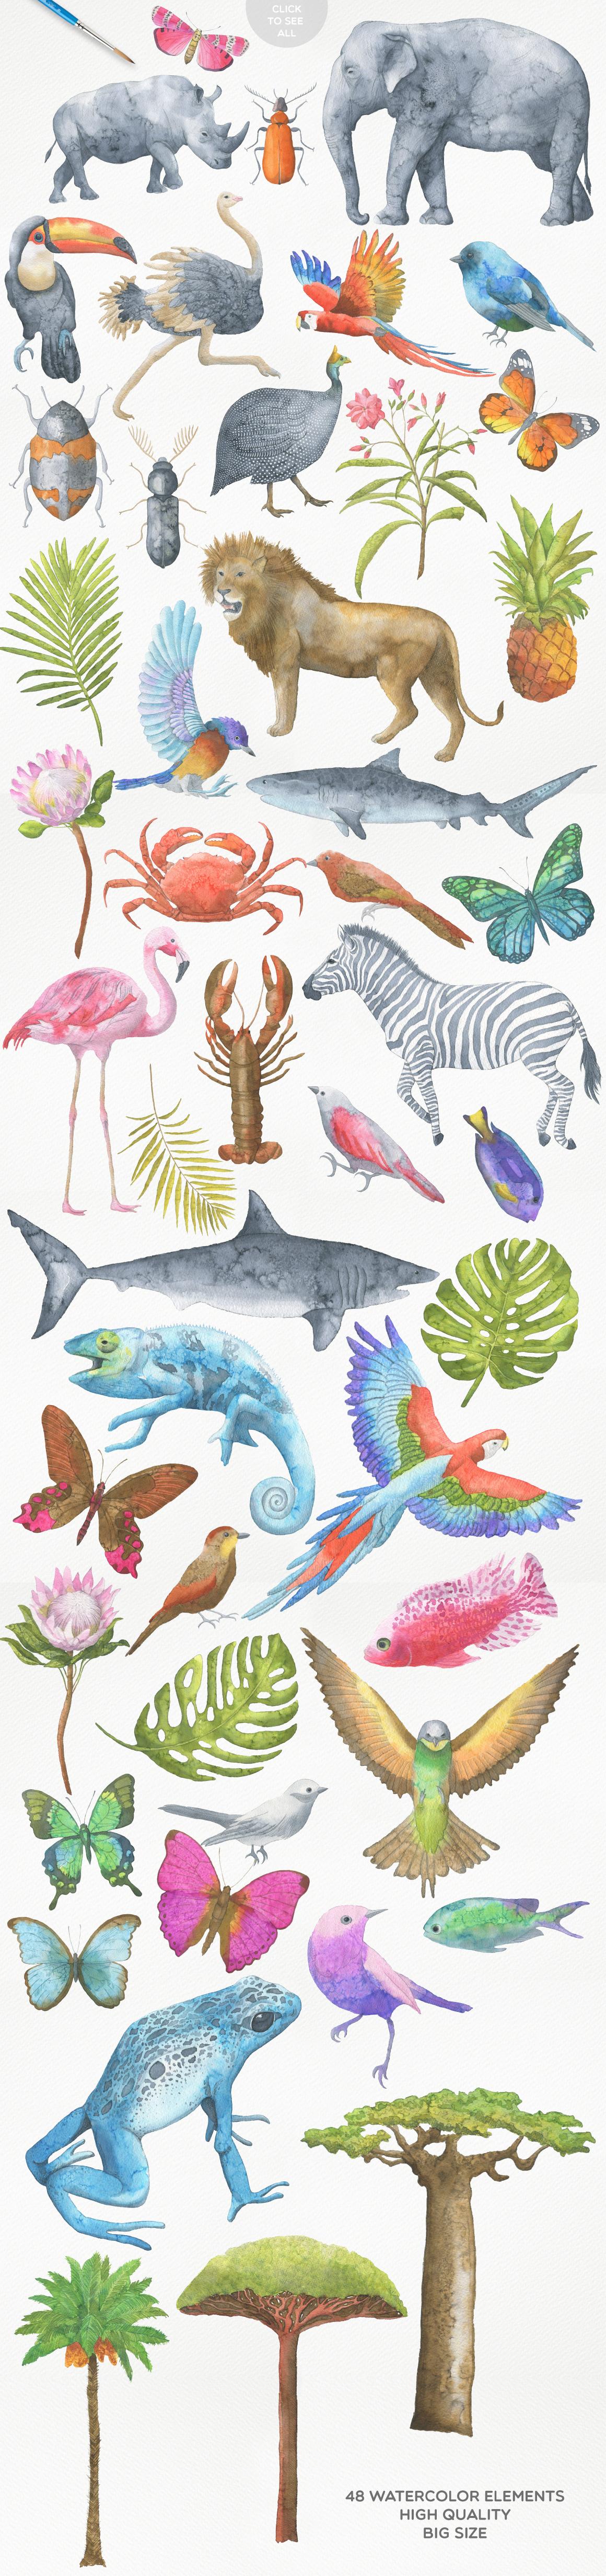 高清手绘野生动物大象犀牛水彩元素PNG图片素材 Safari Watercolor Collection插图(1)